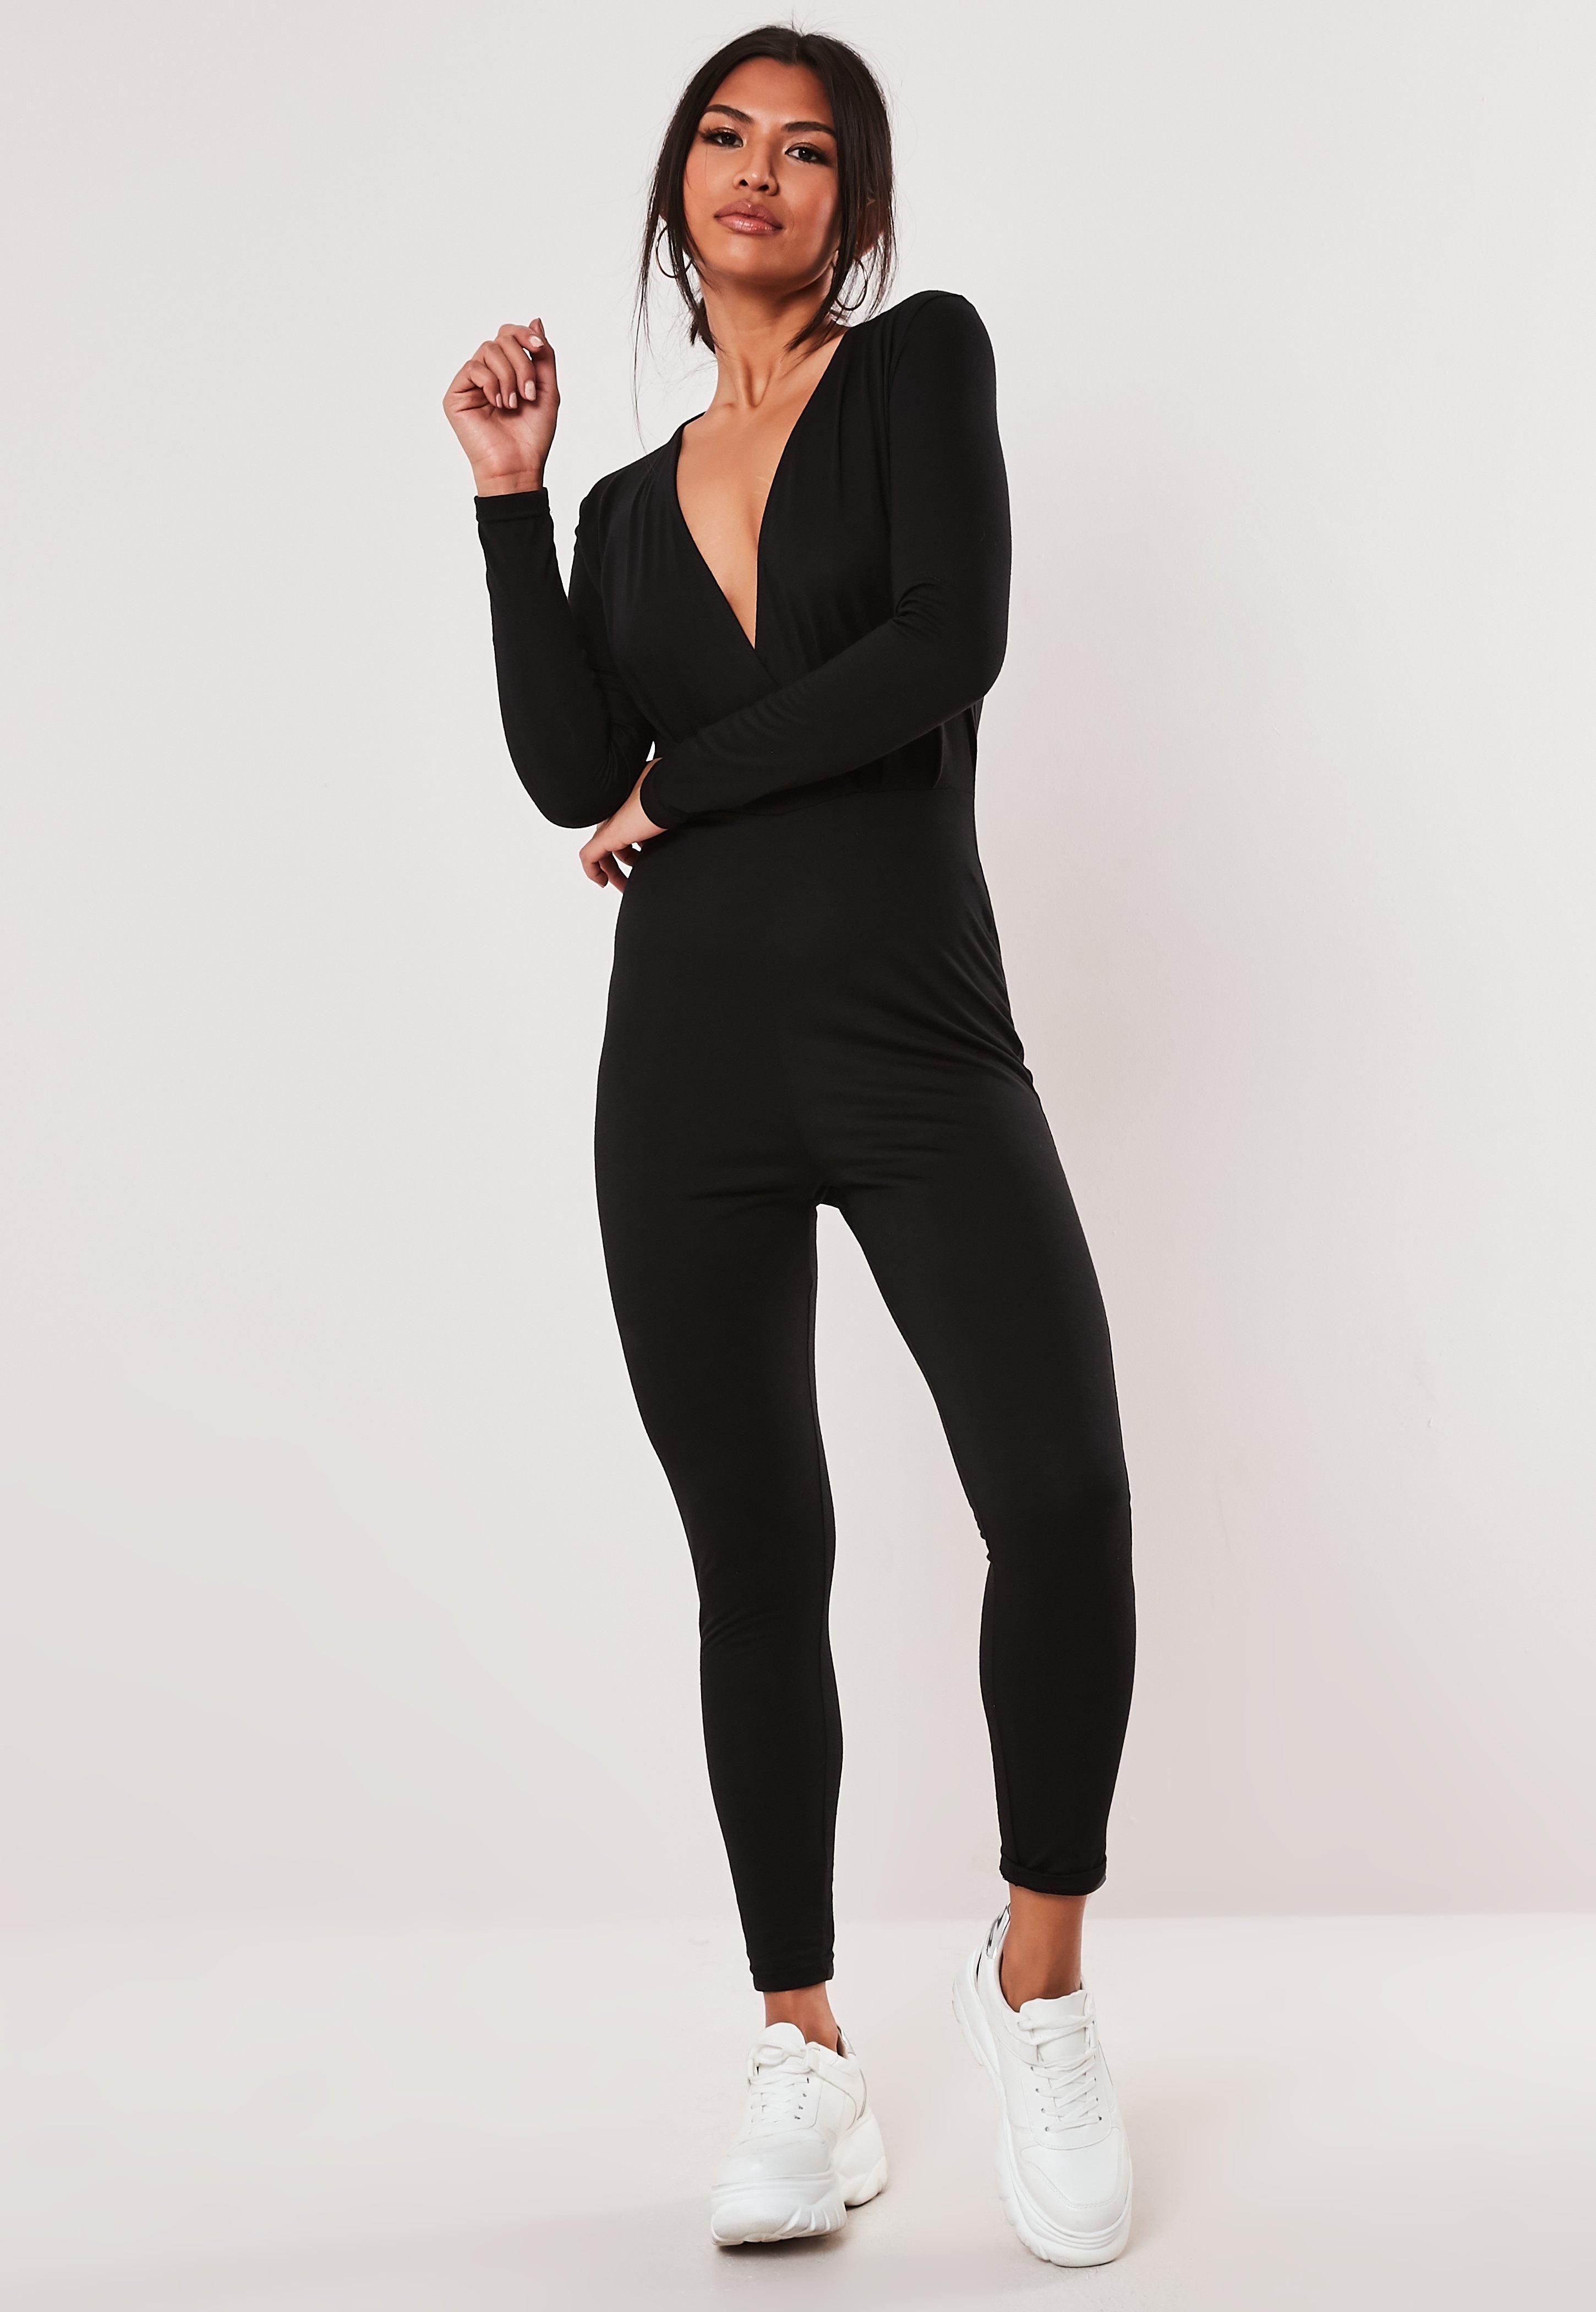 Black Basic Wrap Skinny Leg Jumpsuit Black Basic Wrap Skinny Leg Jumpsuit